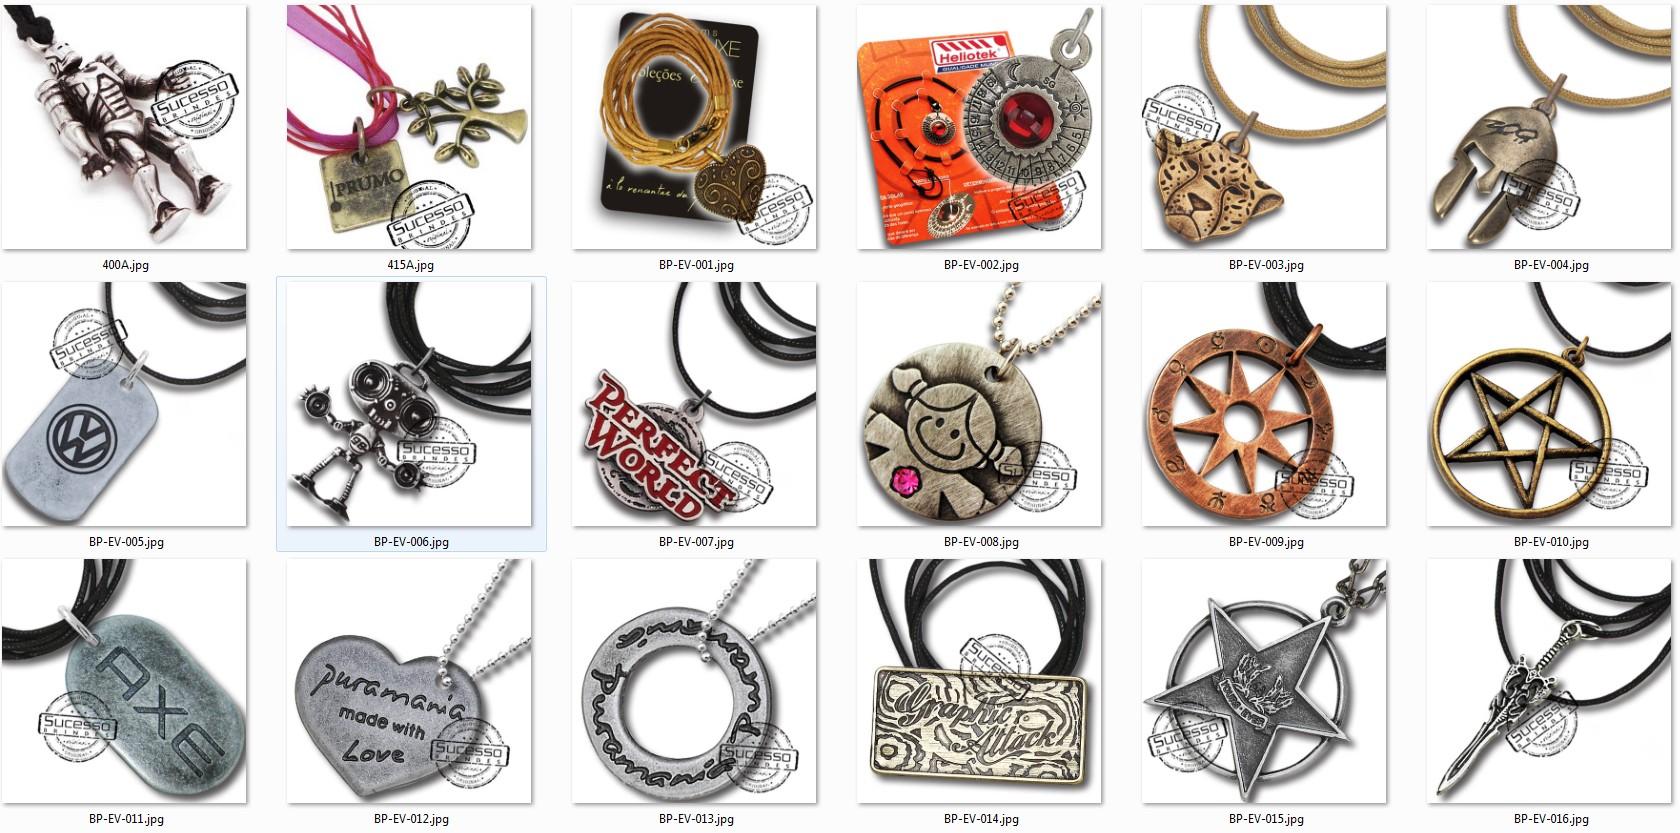 bijuteria promocional personalizada anel pulseira corrente pingente 4